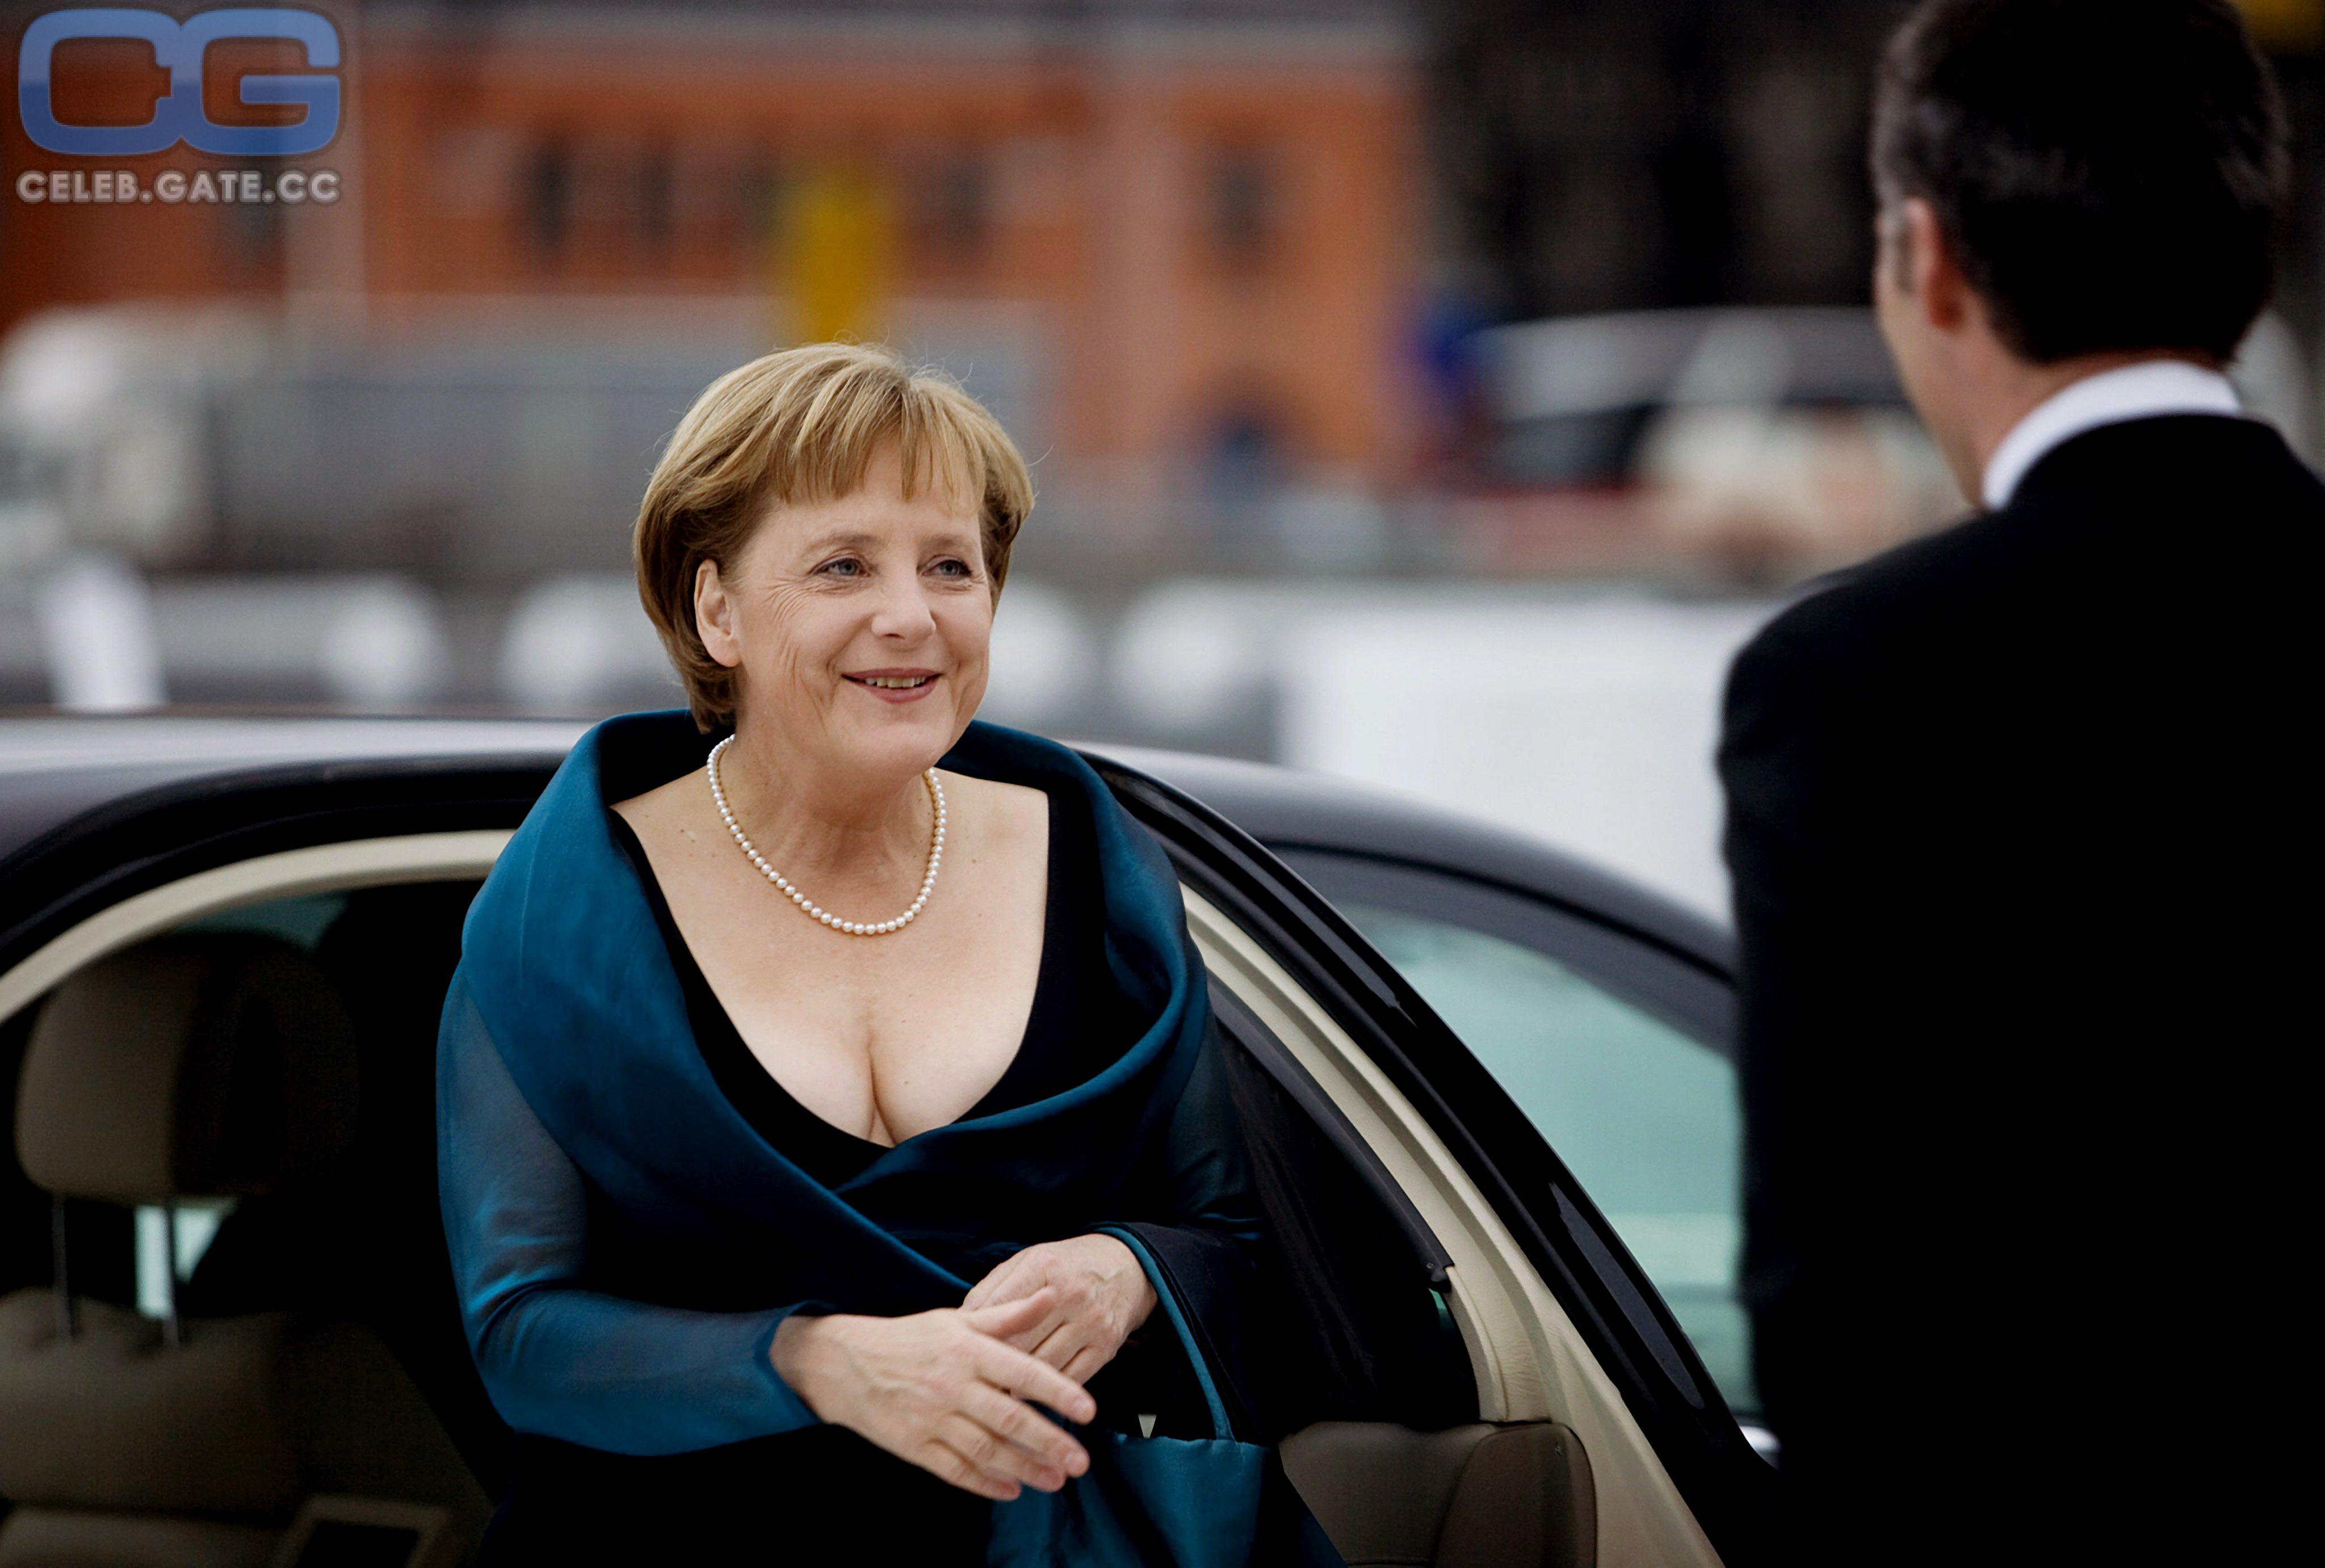 Nacktfoto merkel Angela Merkel: